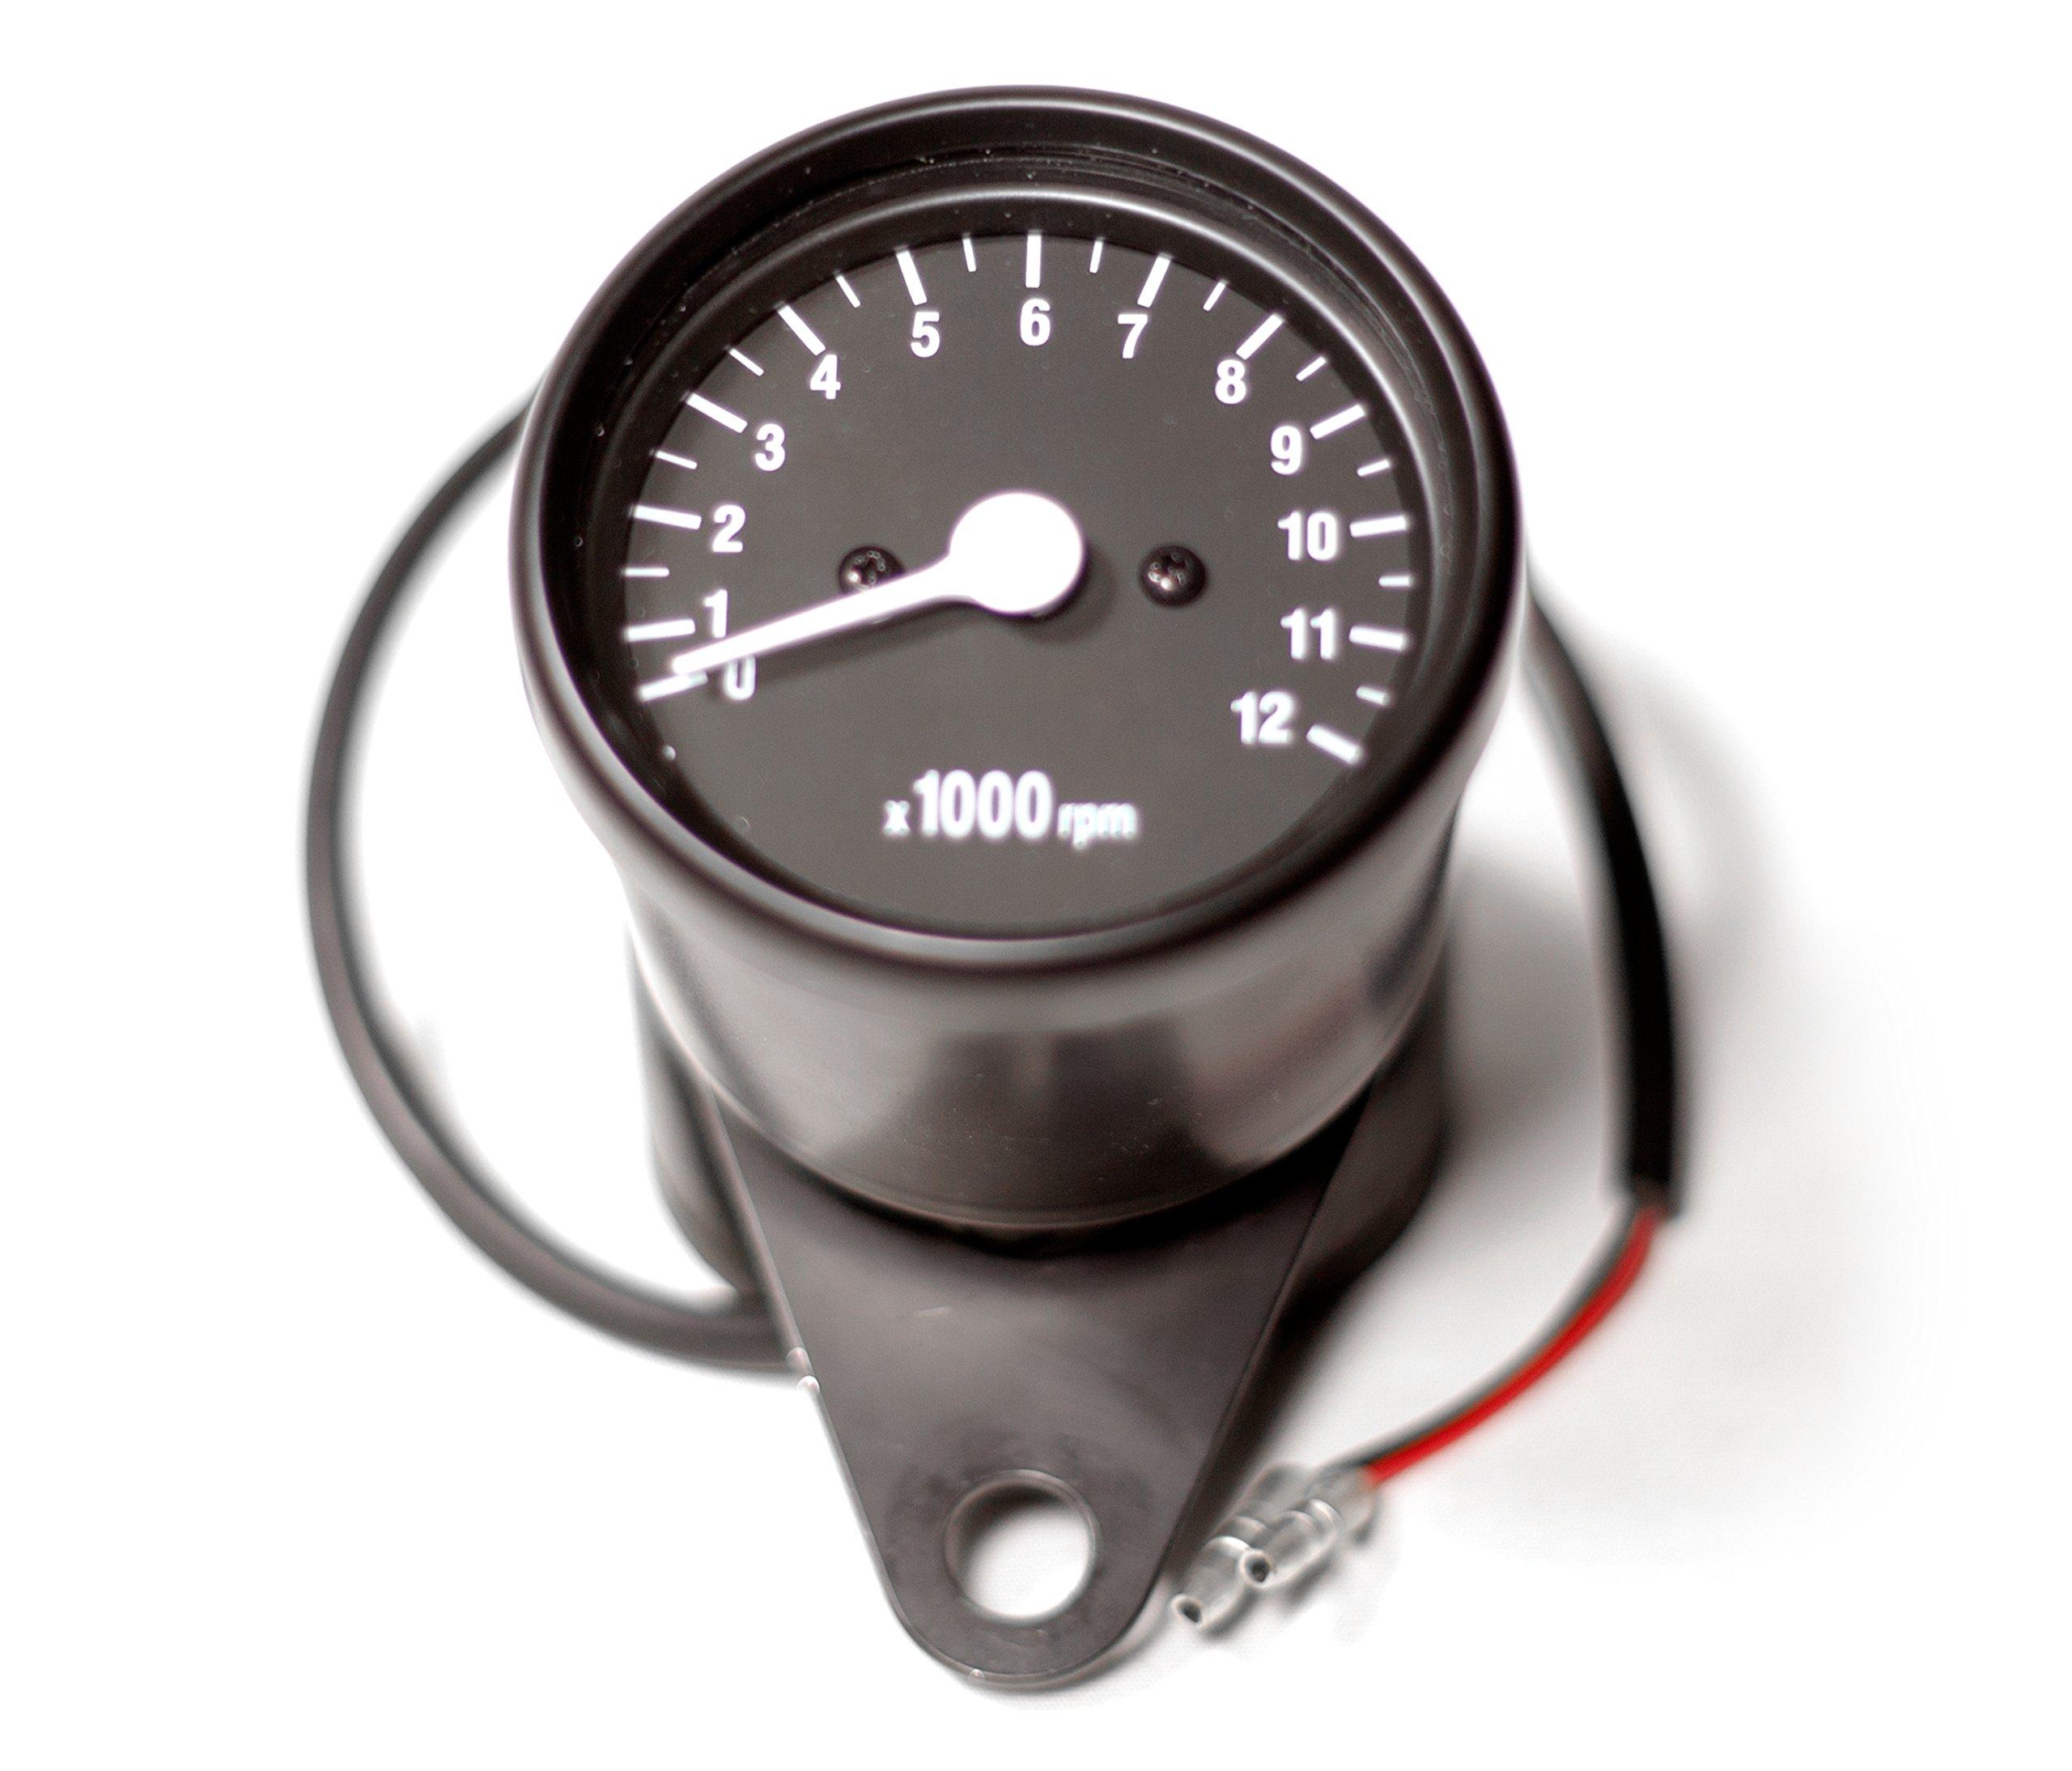 Universal 2.5'' Black Mini Motorcycle Tachometer Gauge w/ Black Face (1:4 Ratio)